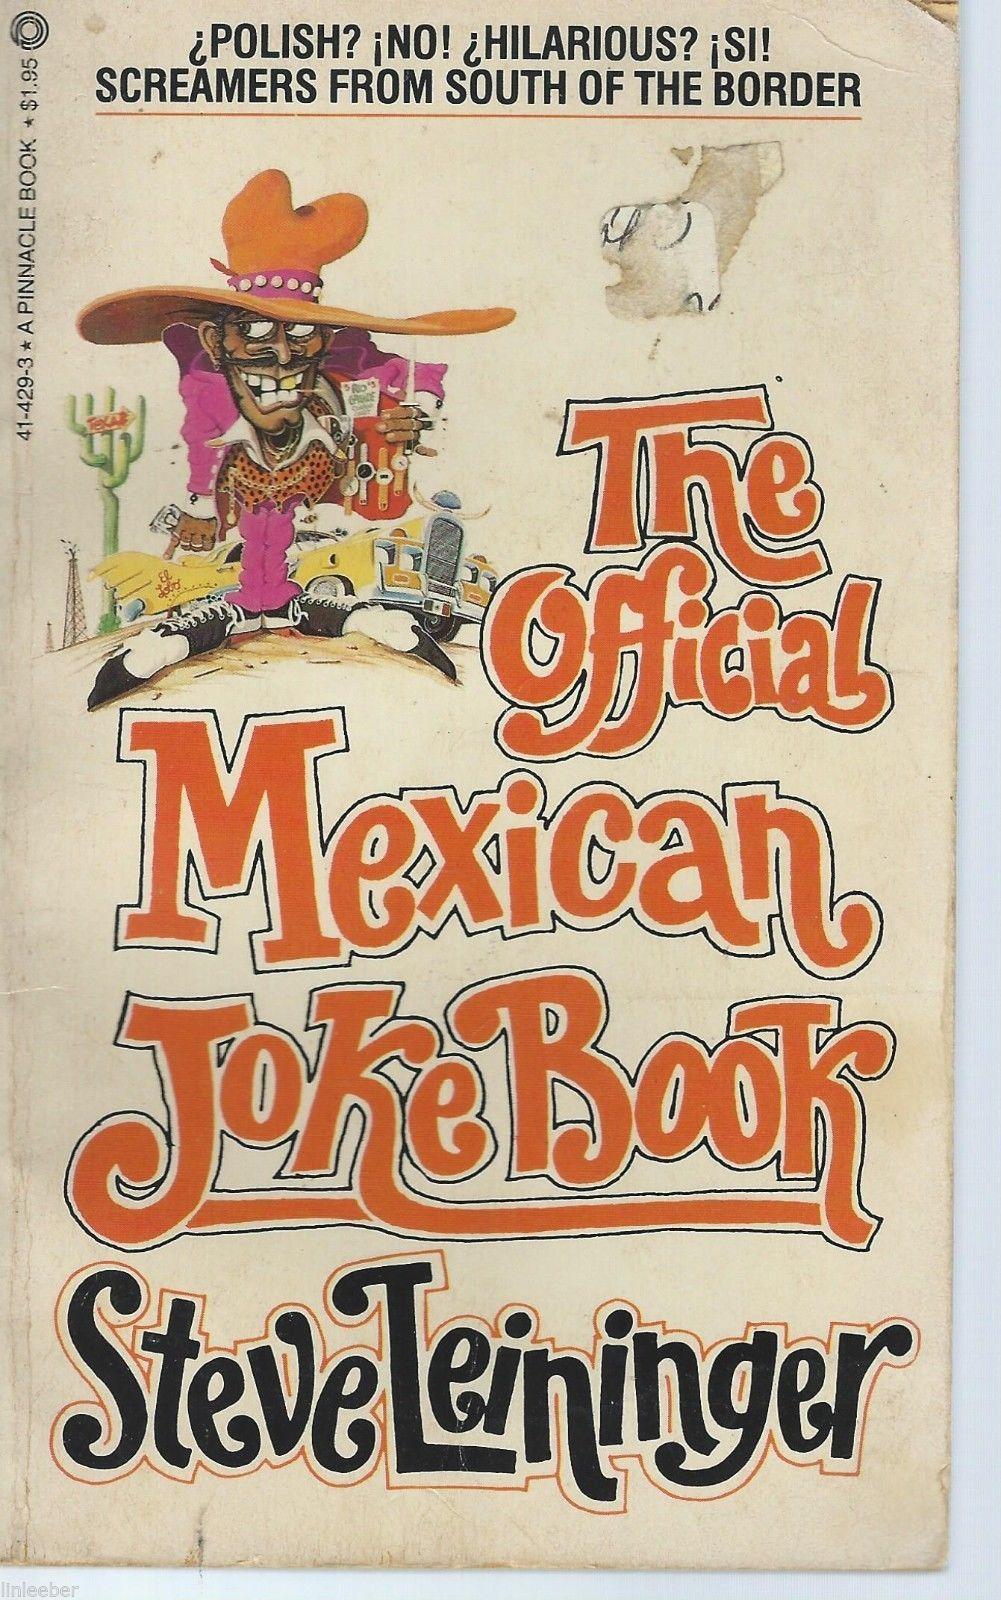 The Official Mexican Joke Book by Steve Leininger;1984;1st Printing;Scott Ross